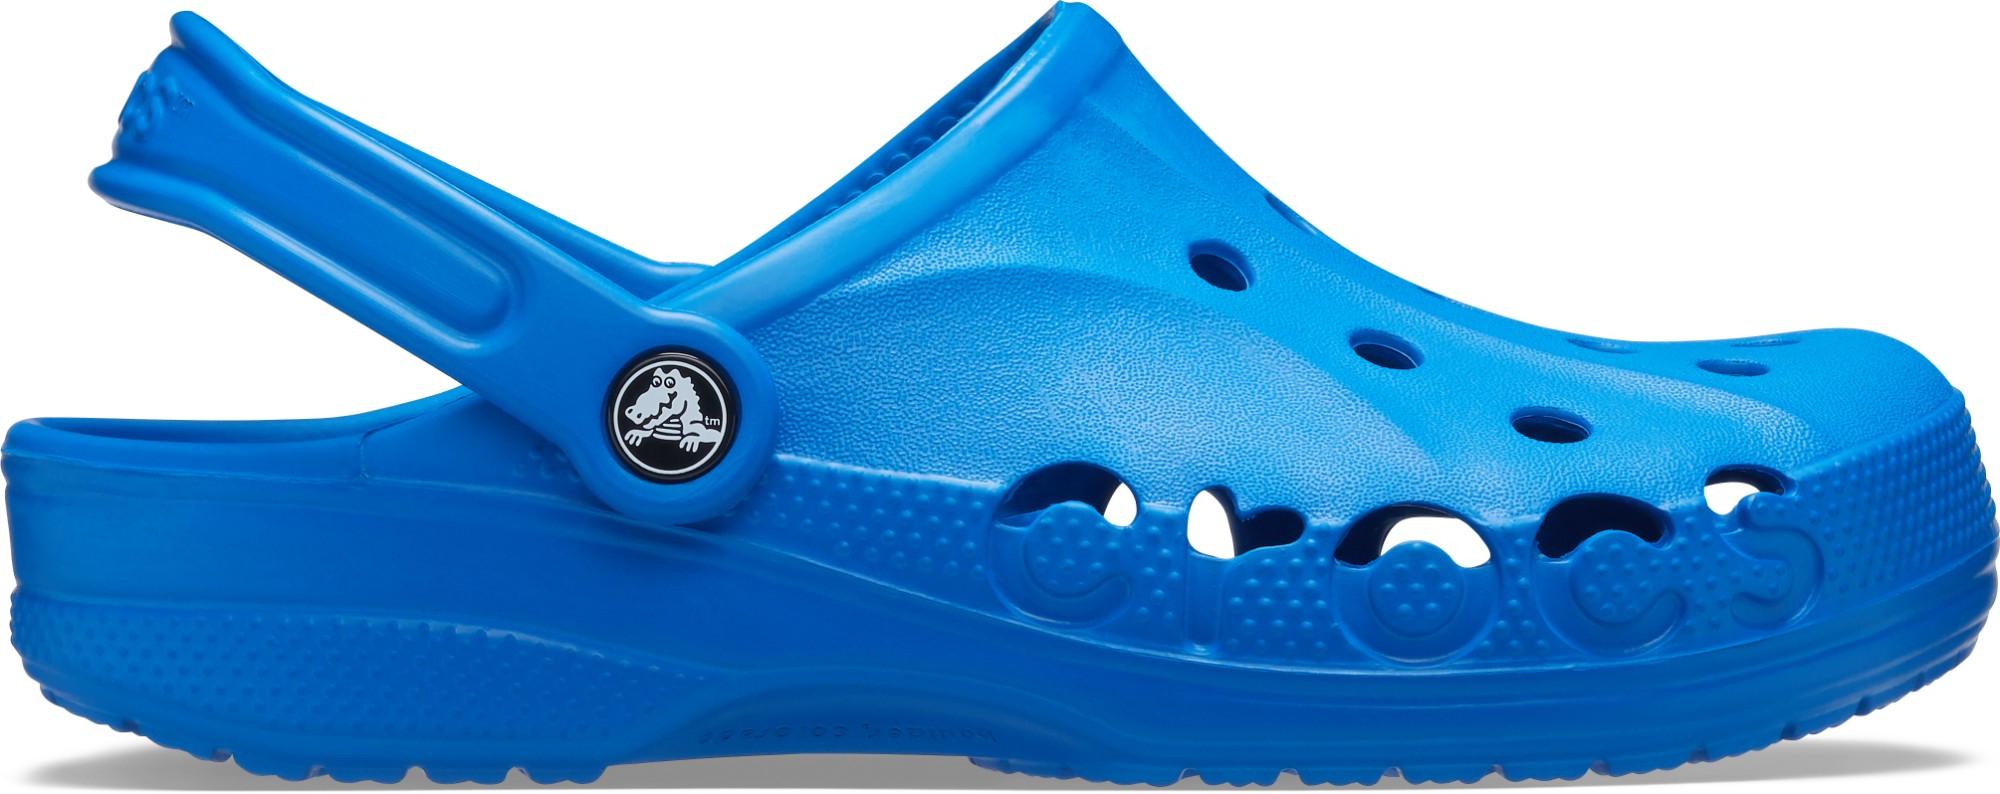 Crocs™ Baya Bright Cobalt 36,5